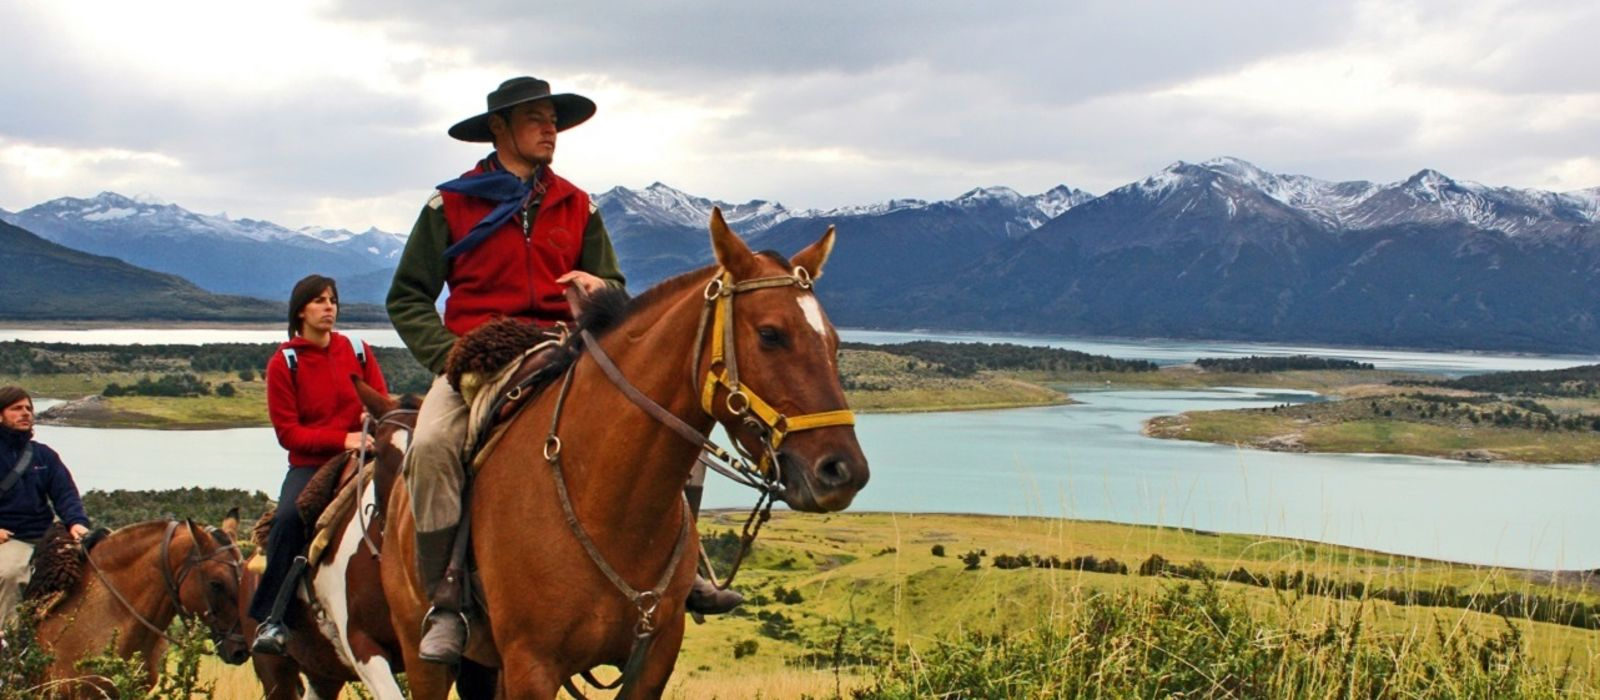 Enchanting Travels Argentina Tours-Culture in Argentina - Gauchos